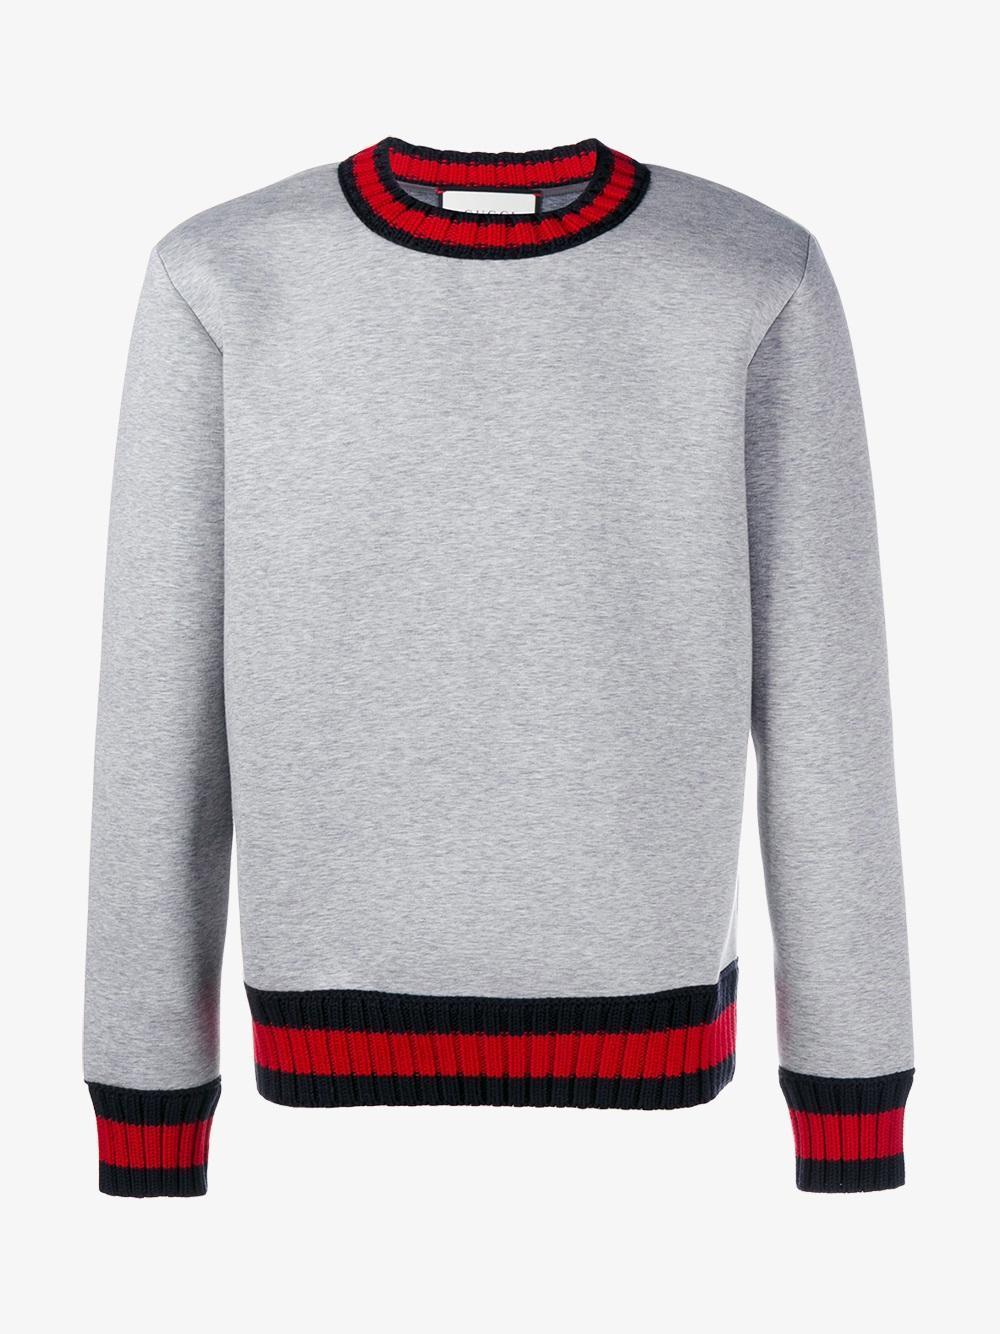 6ec52314ca07f1 Gucci Web Trim Sweatshirt in Gray for Men - Lyst